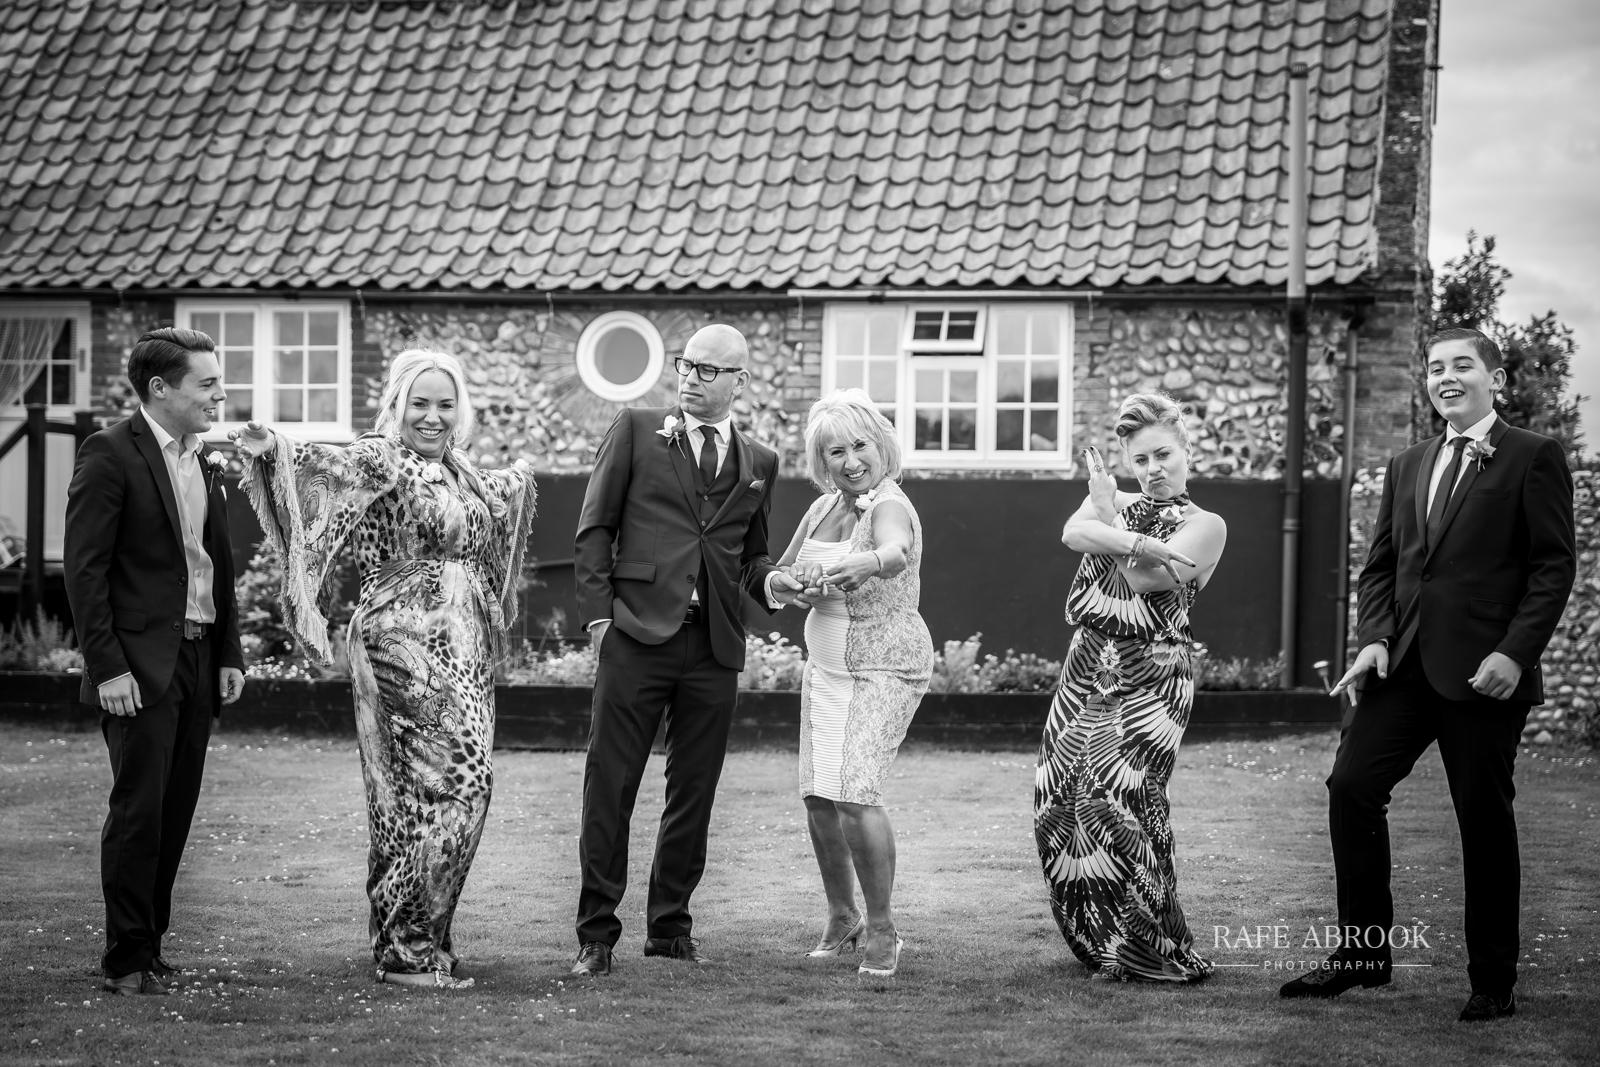 cley windmill wedding norfolk hertfordshire wedding photographer-1149.jpg